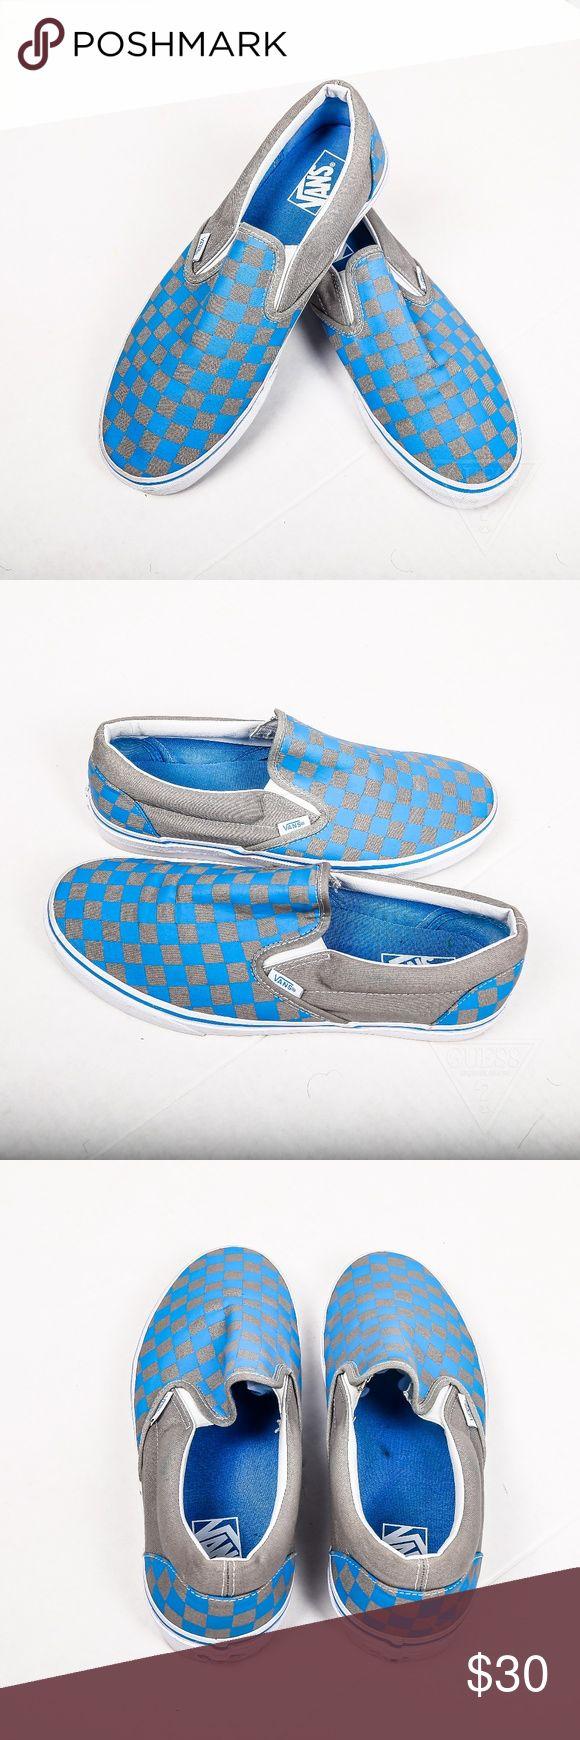 Men's blue and grey checkered slip on vans sz 10 Men's blue and grey  checkered slip